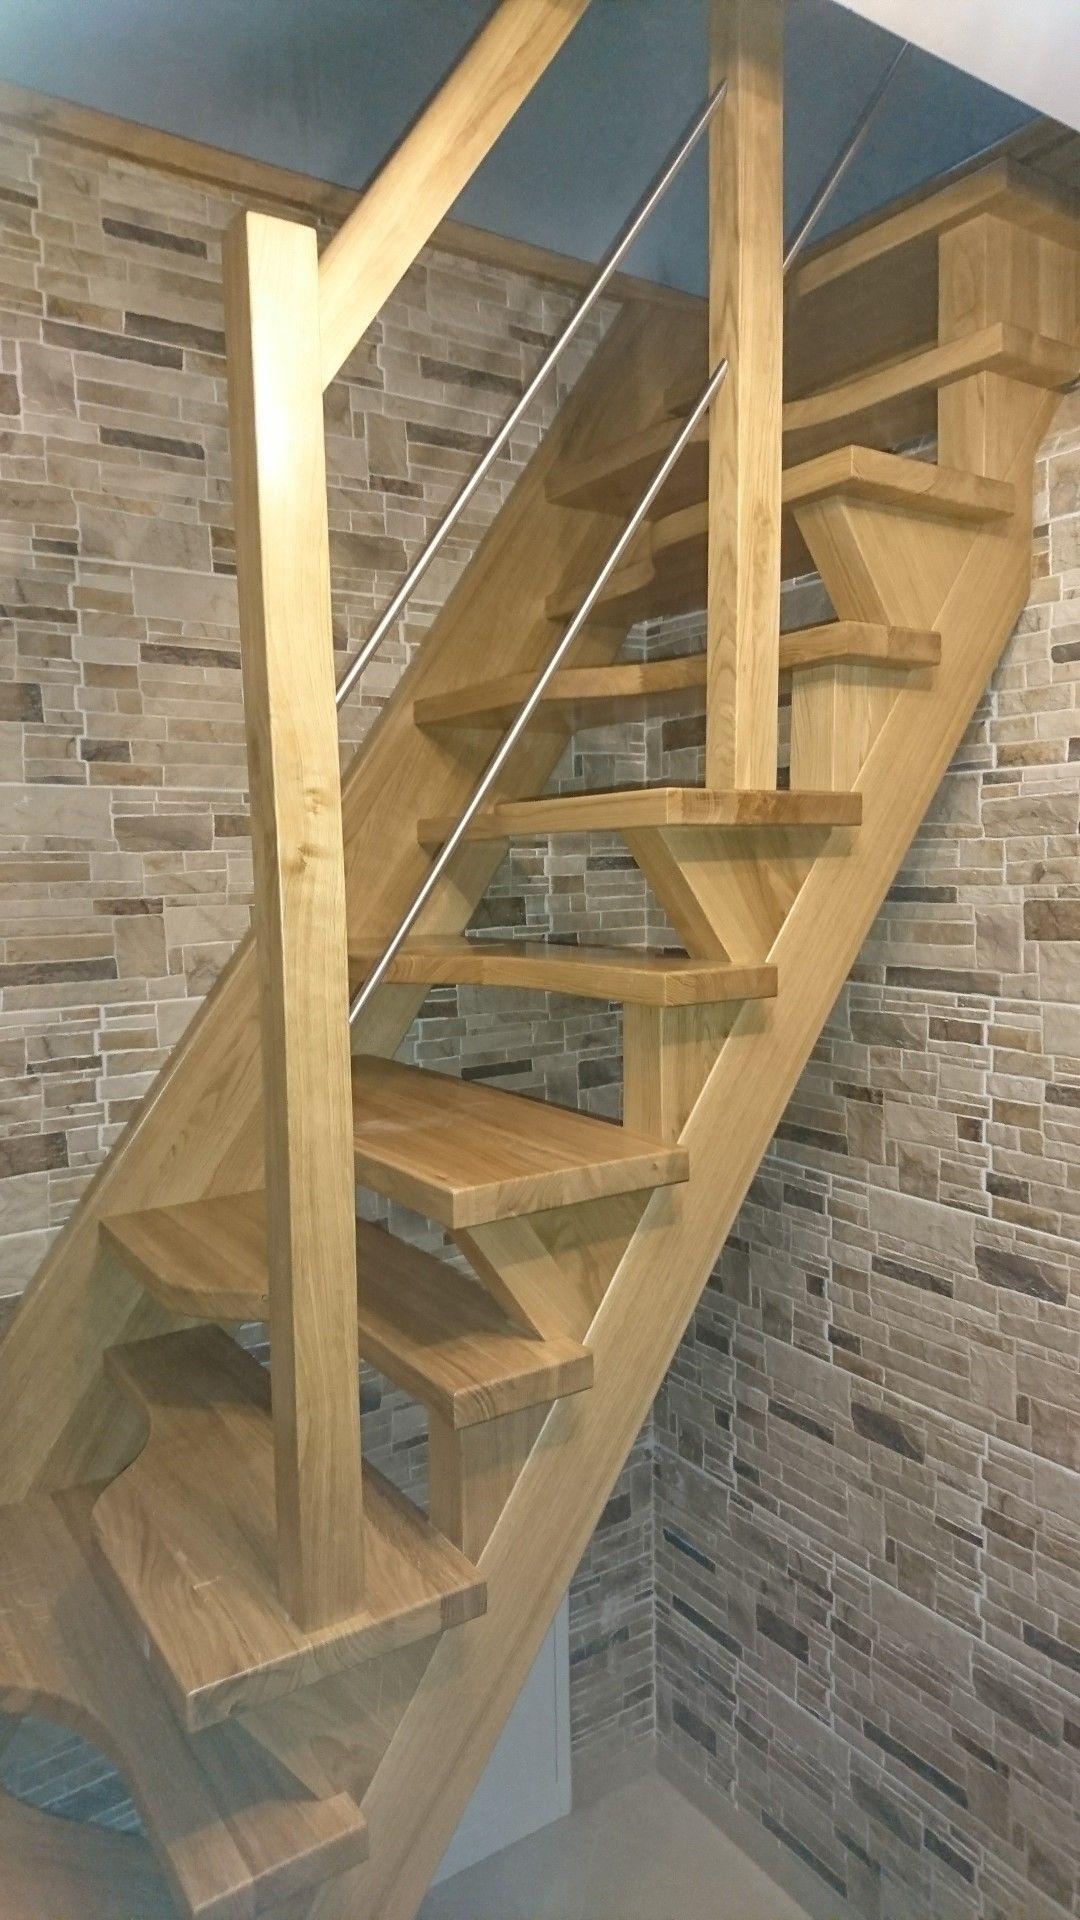 10 Savory Bedroom Attic Bathroom Ideas Stairs Design Stairs Diy Stairs